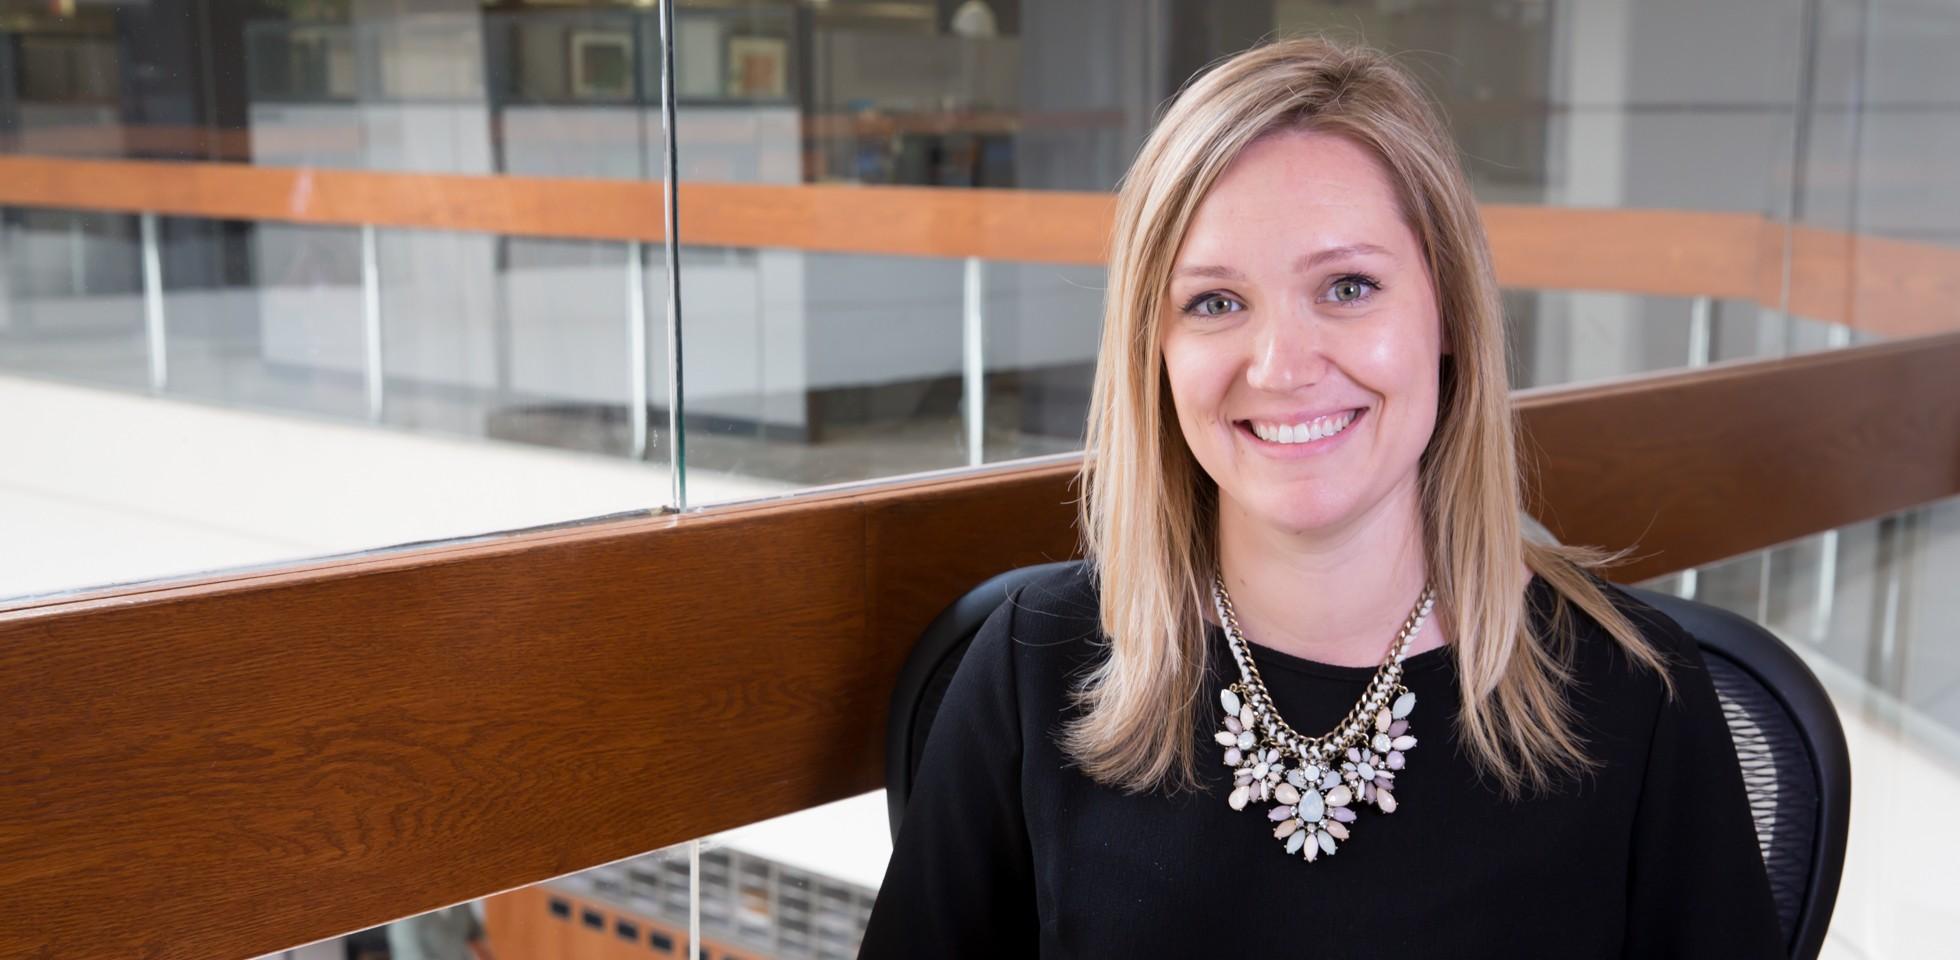 Katherine Cooper, Account Associate - HUB International Careers